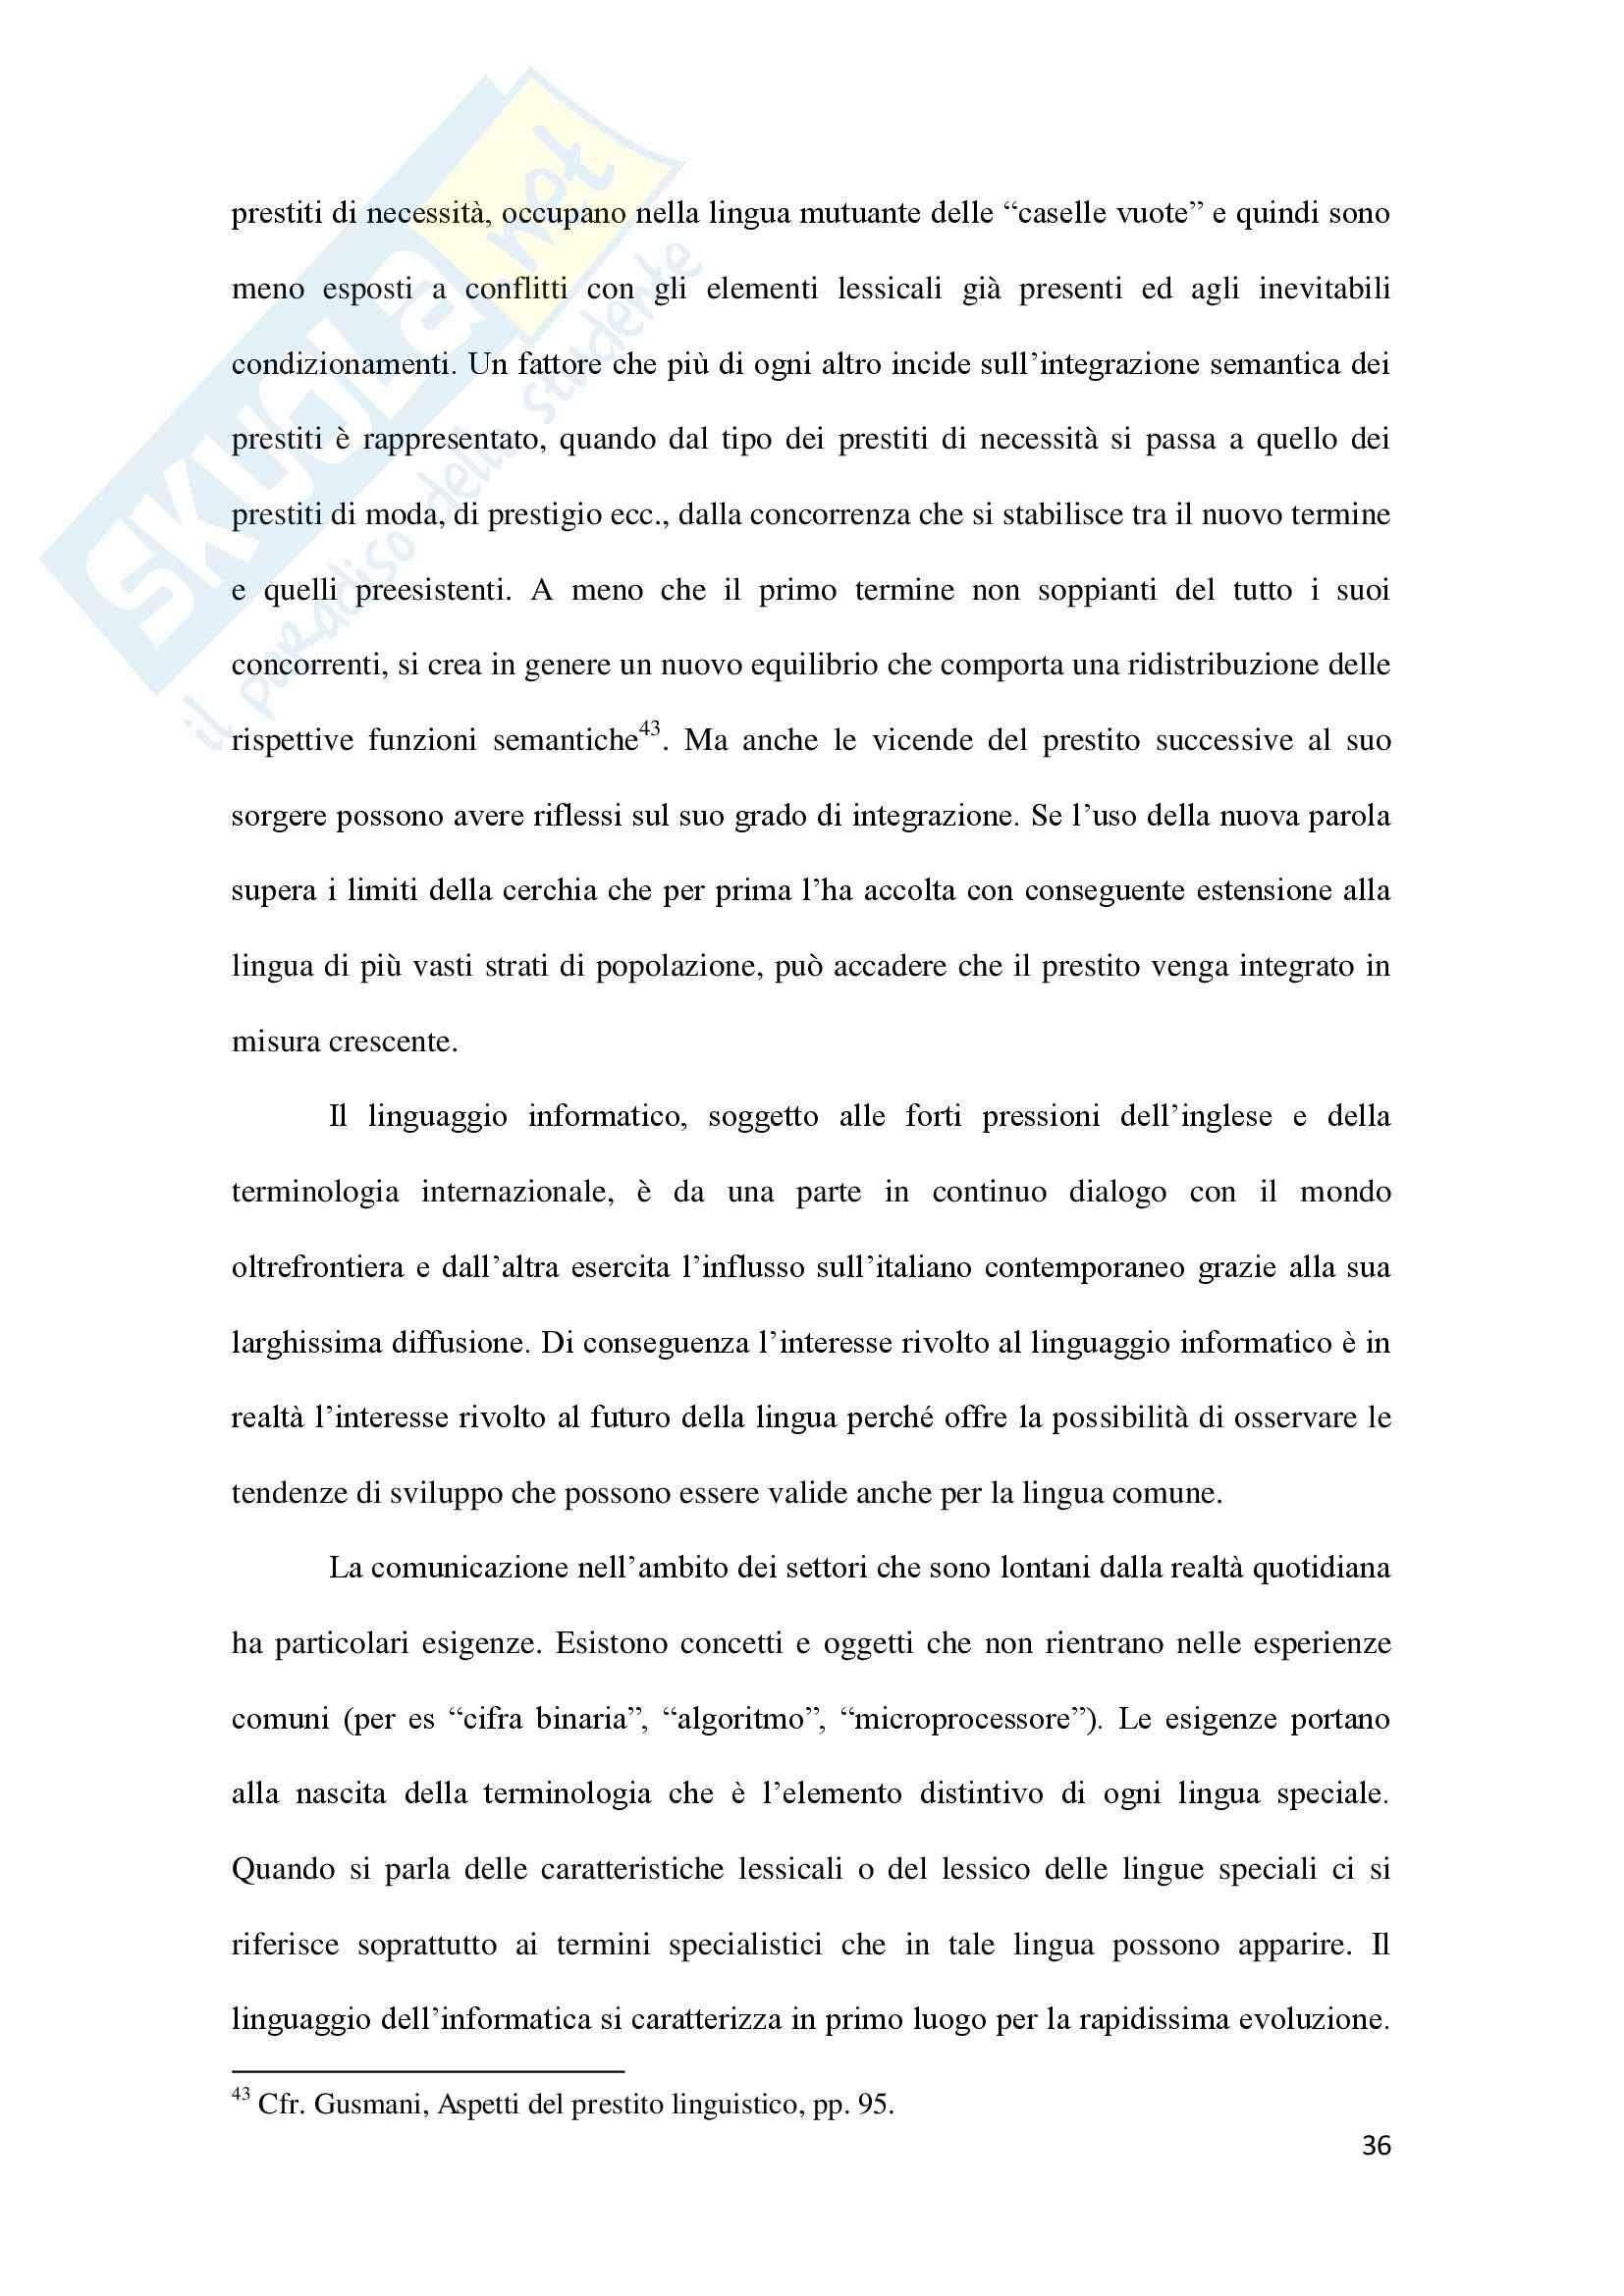 Linguaggio di Internet, Lingua inglese Pag. 36